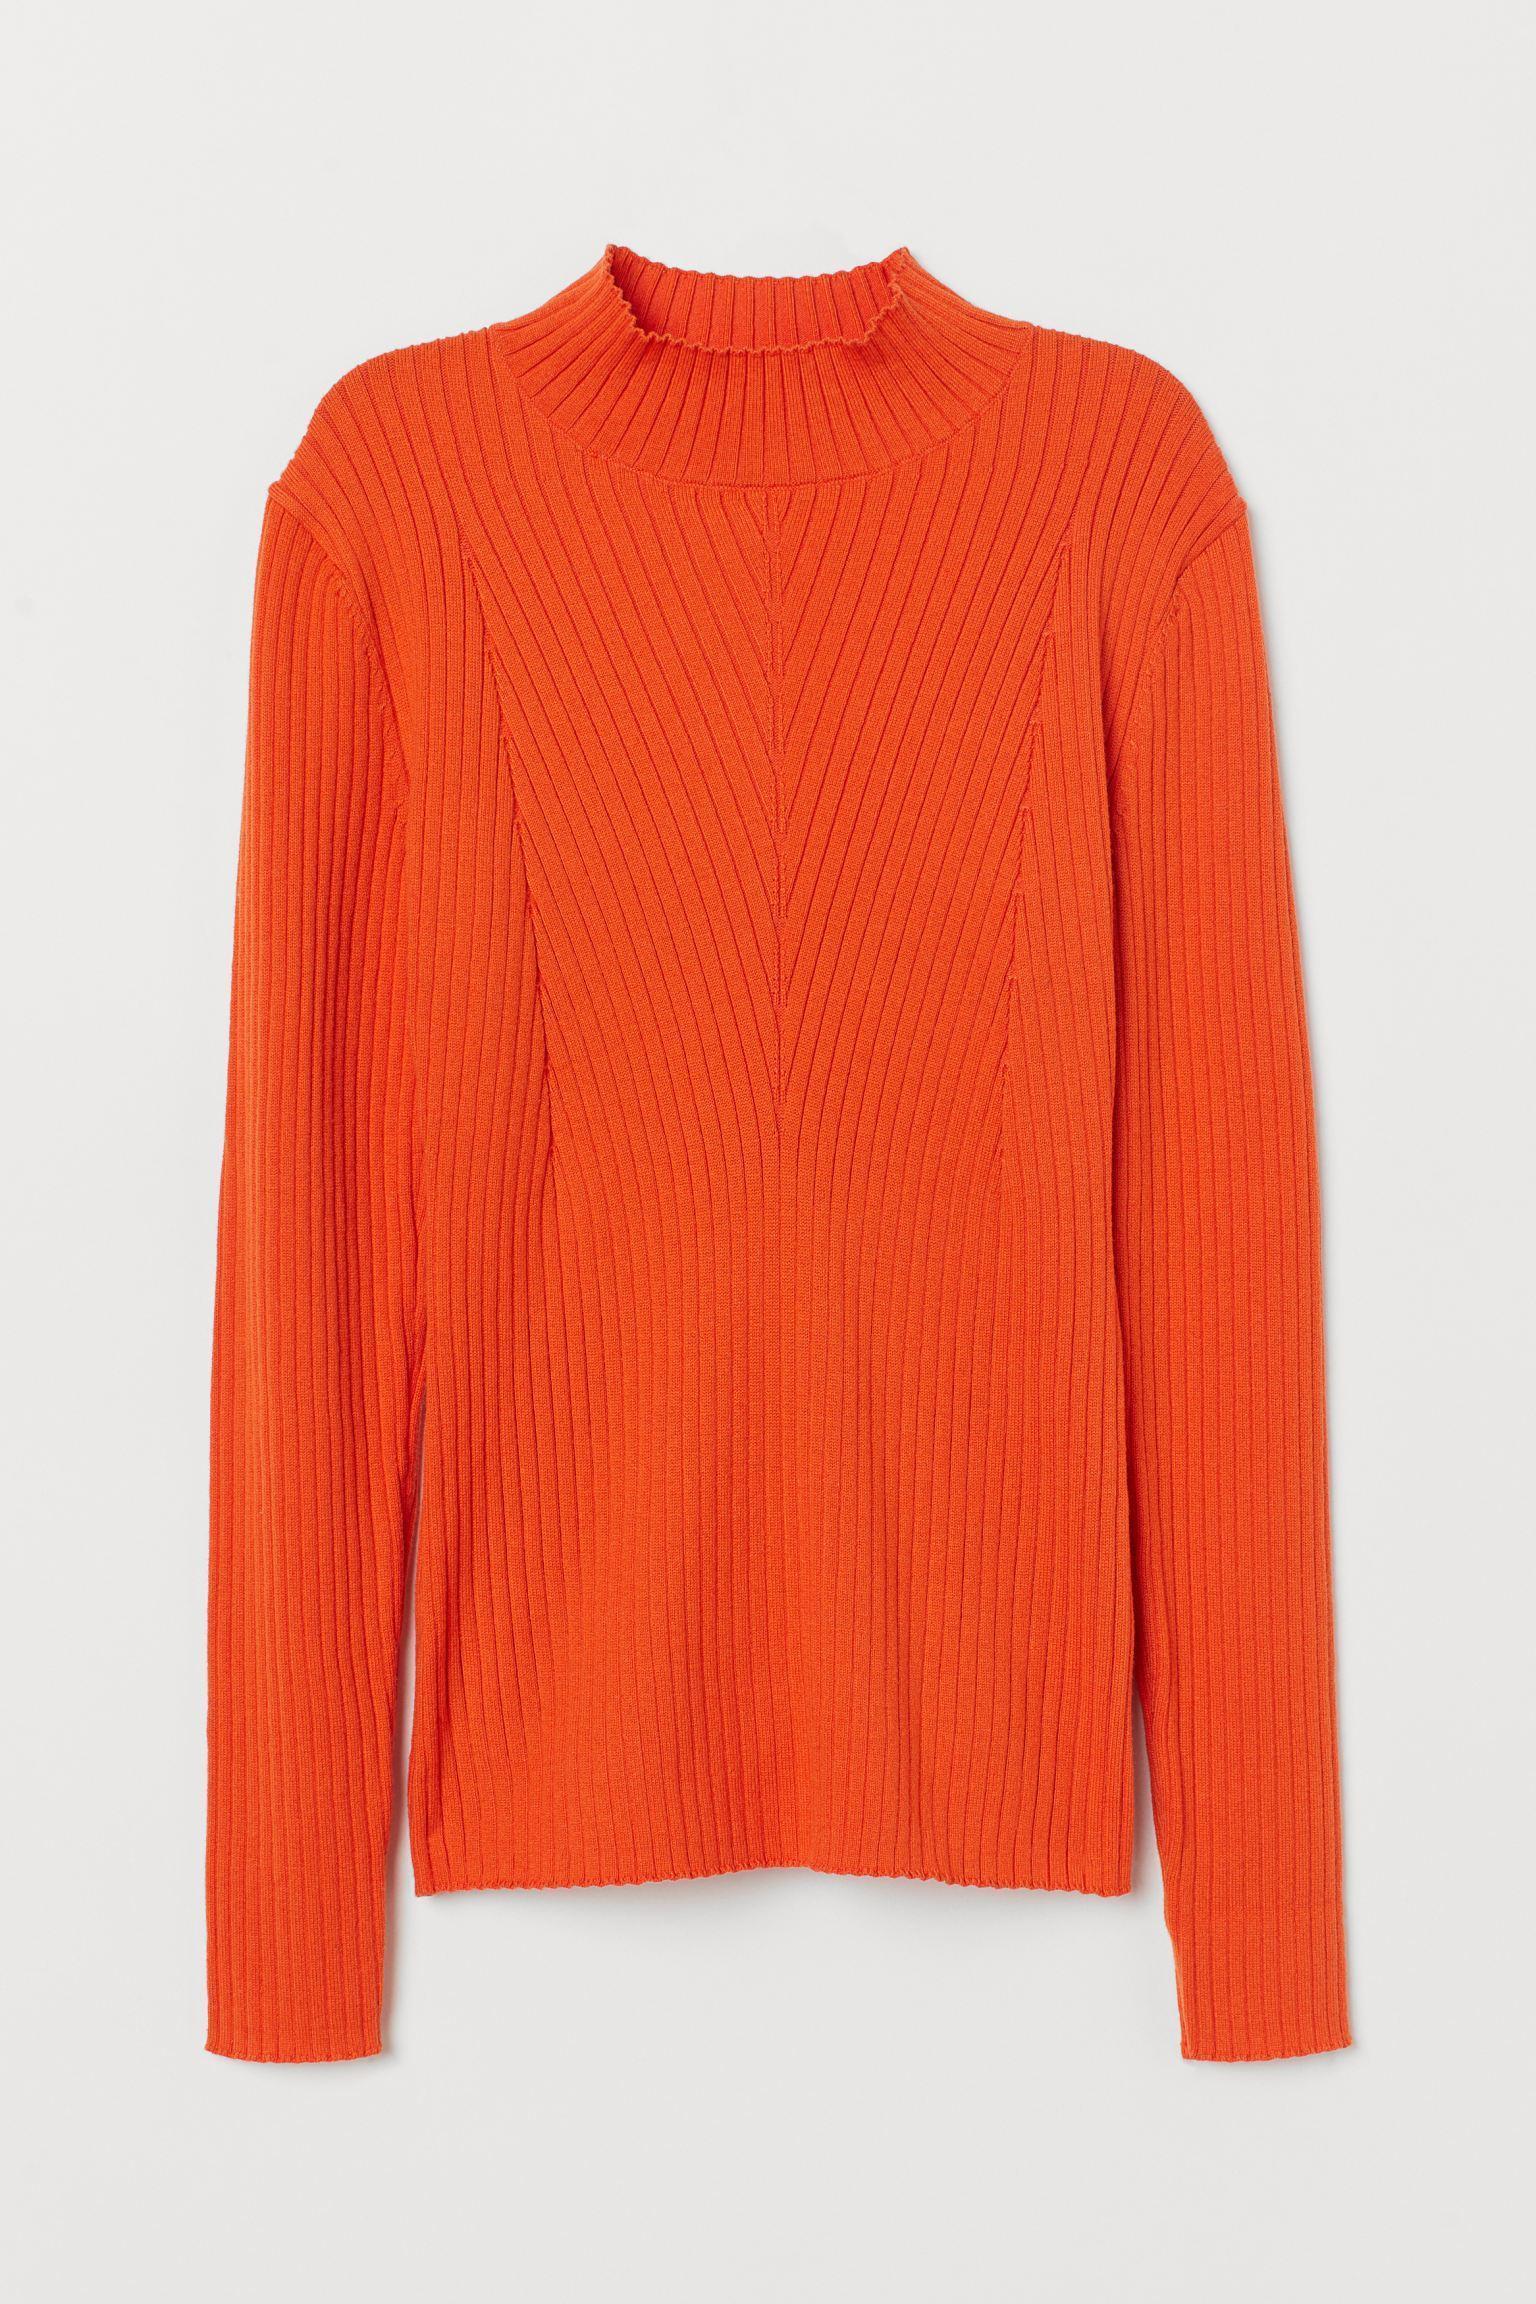 Отзыв на Rippenpullover с Водолазка из Интернет-Магазина H&M